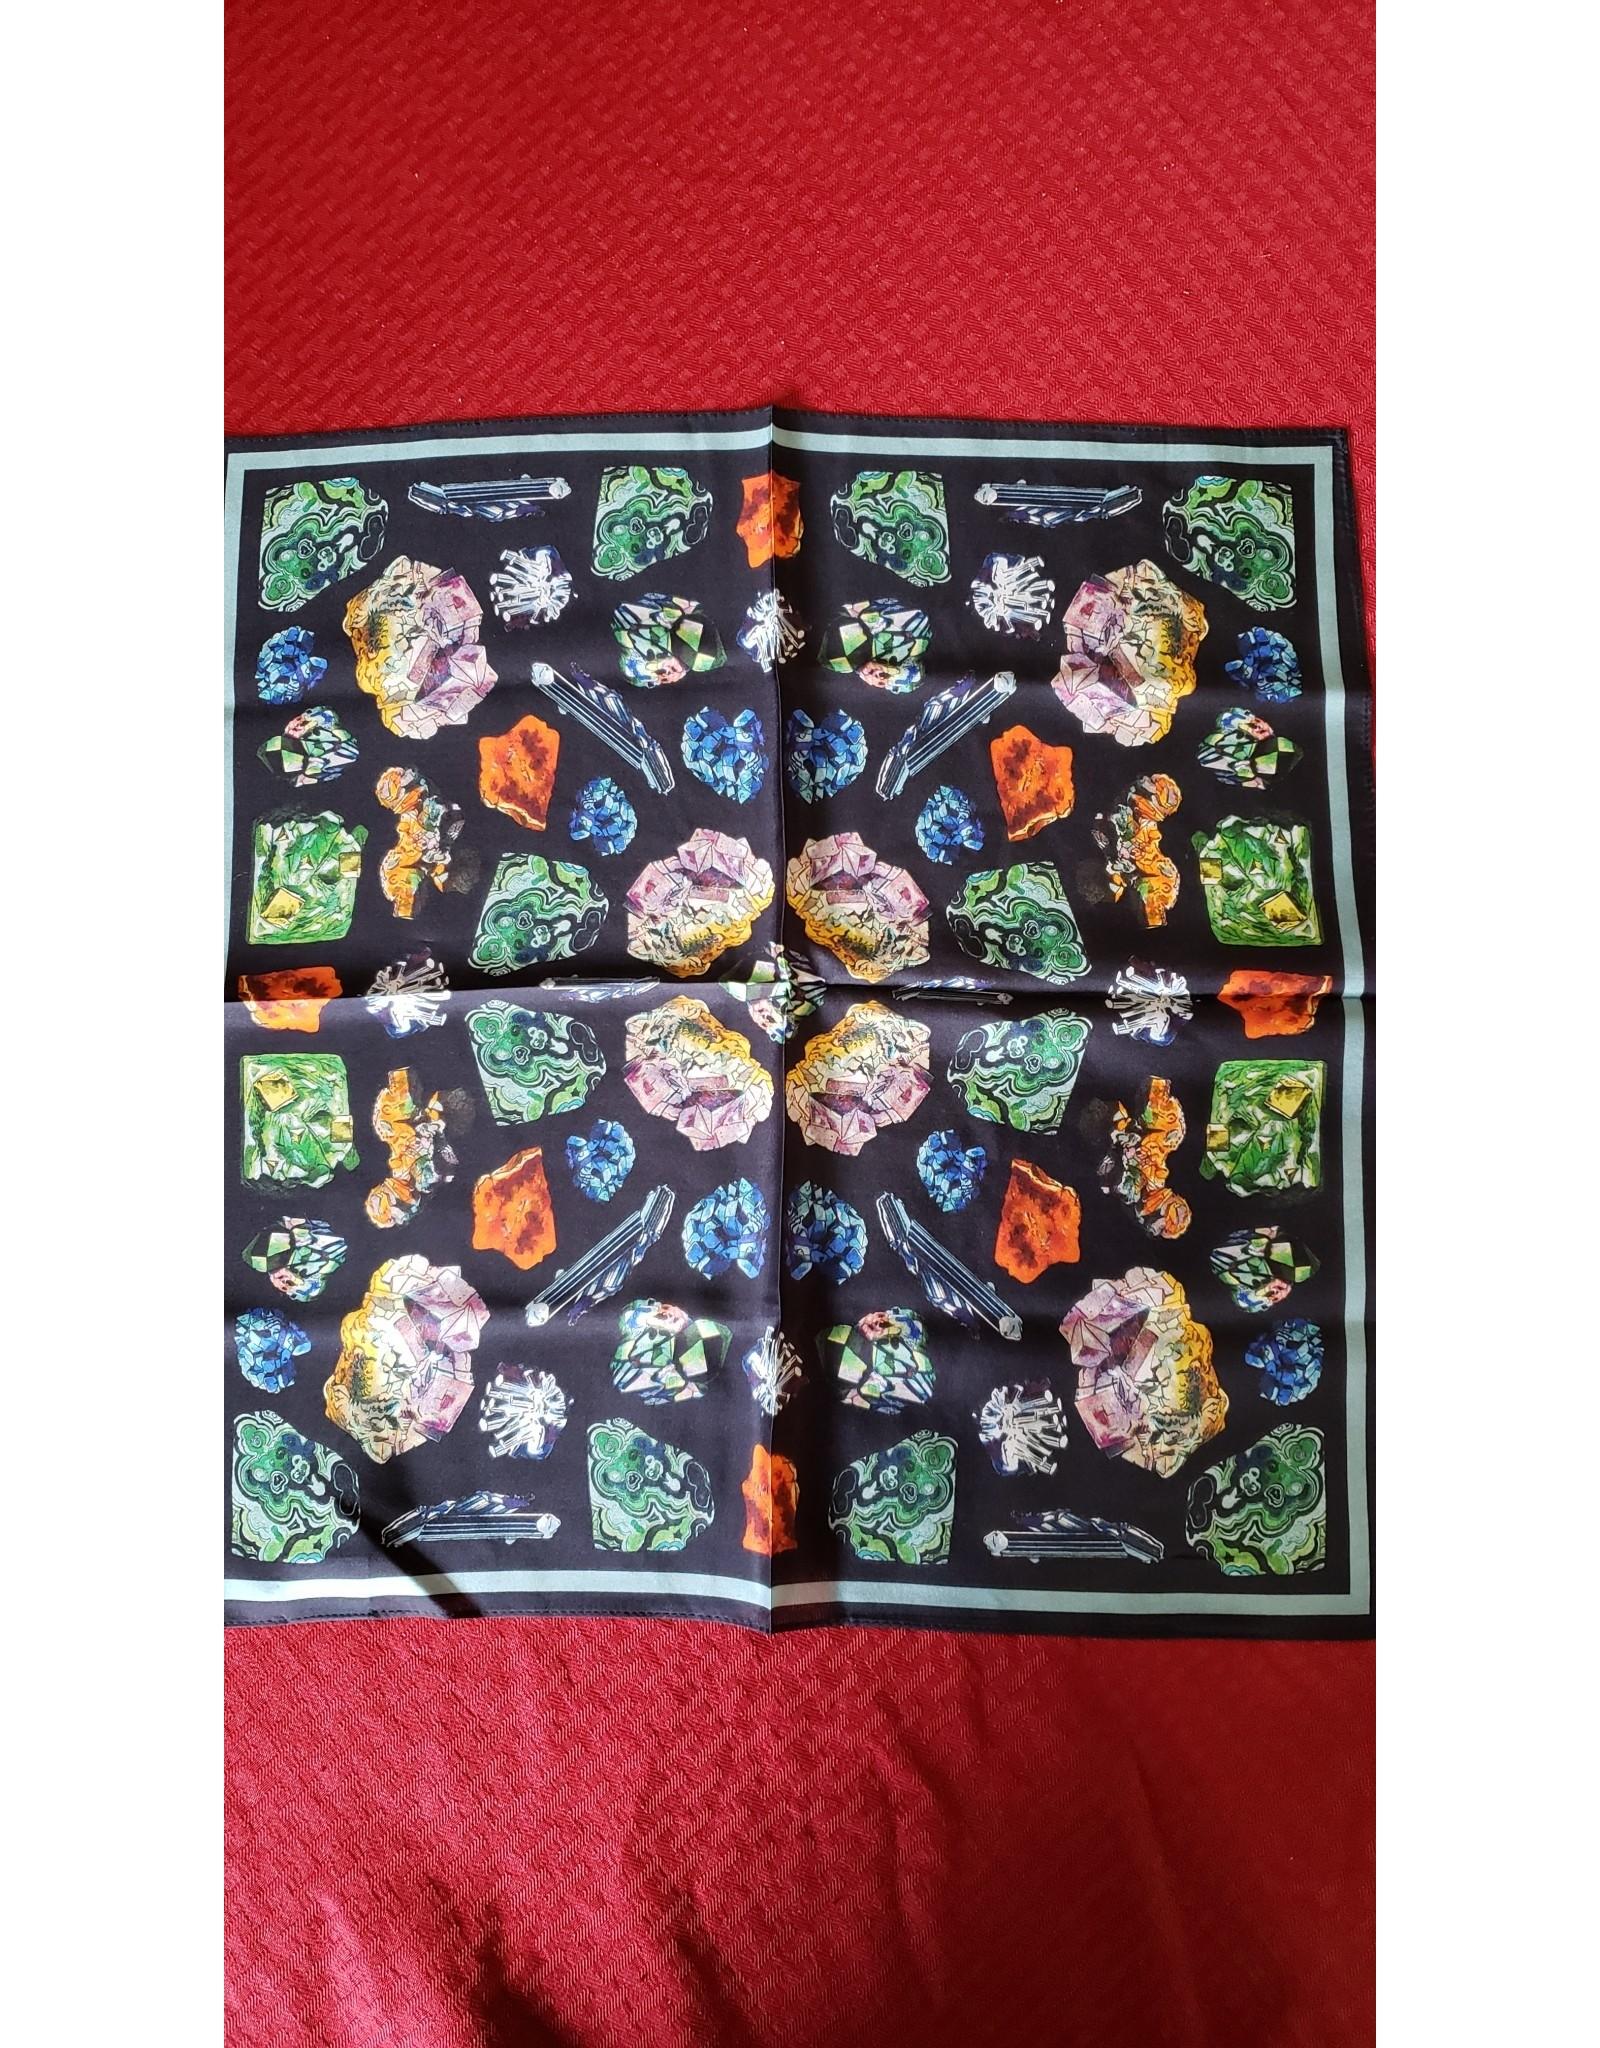 "100% Silk Scarf 17""x17"" | Gems & Minerals Bandana"